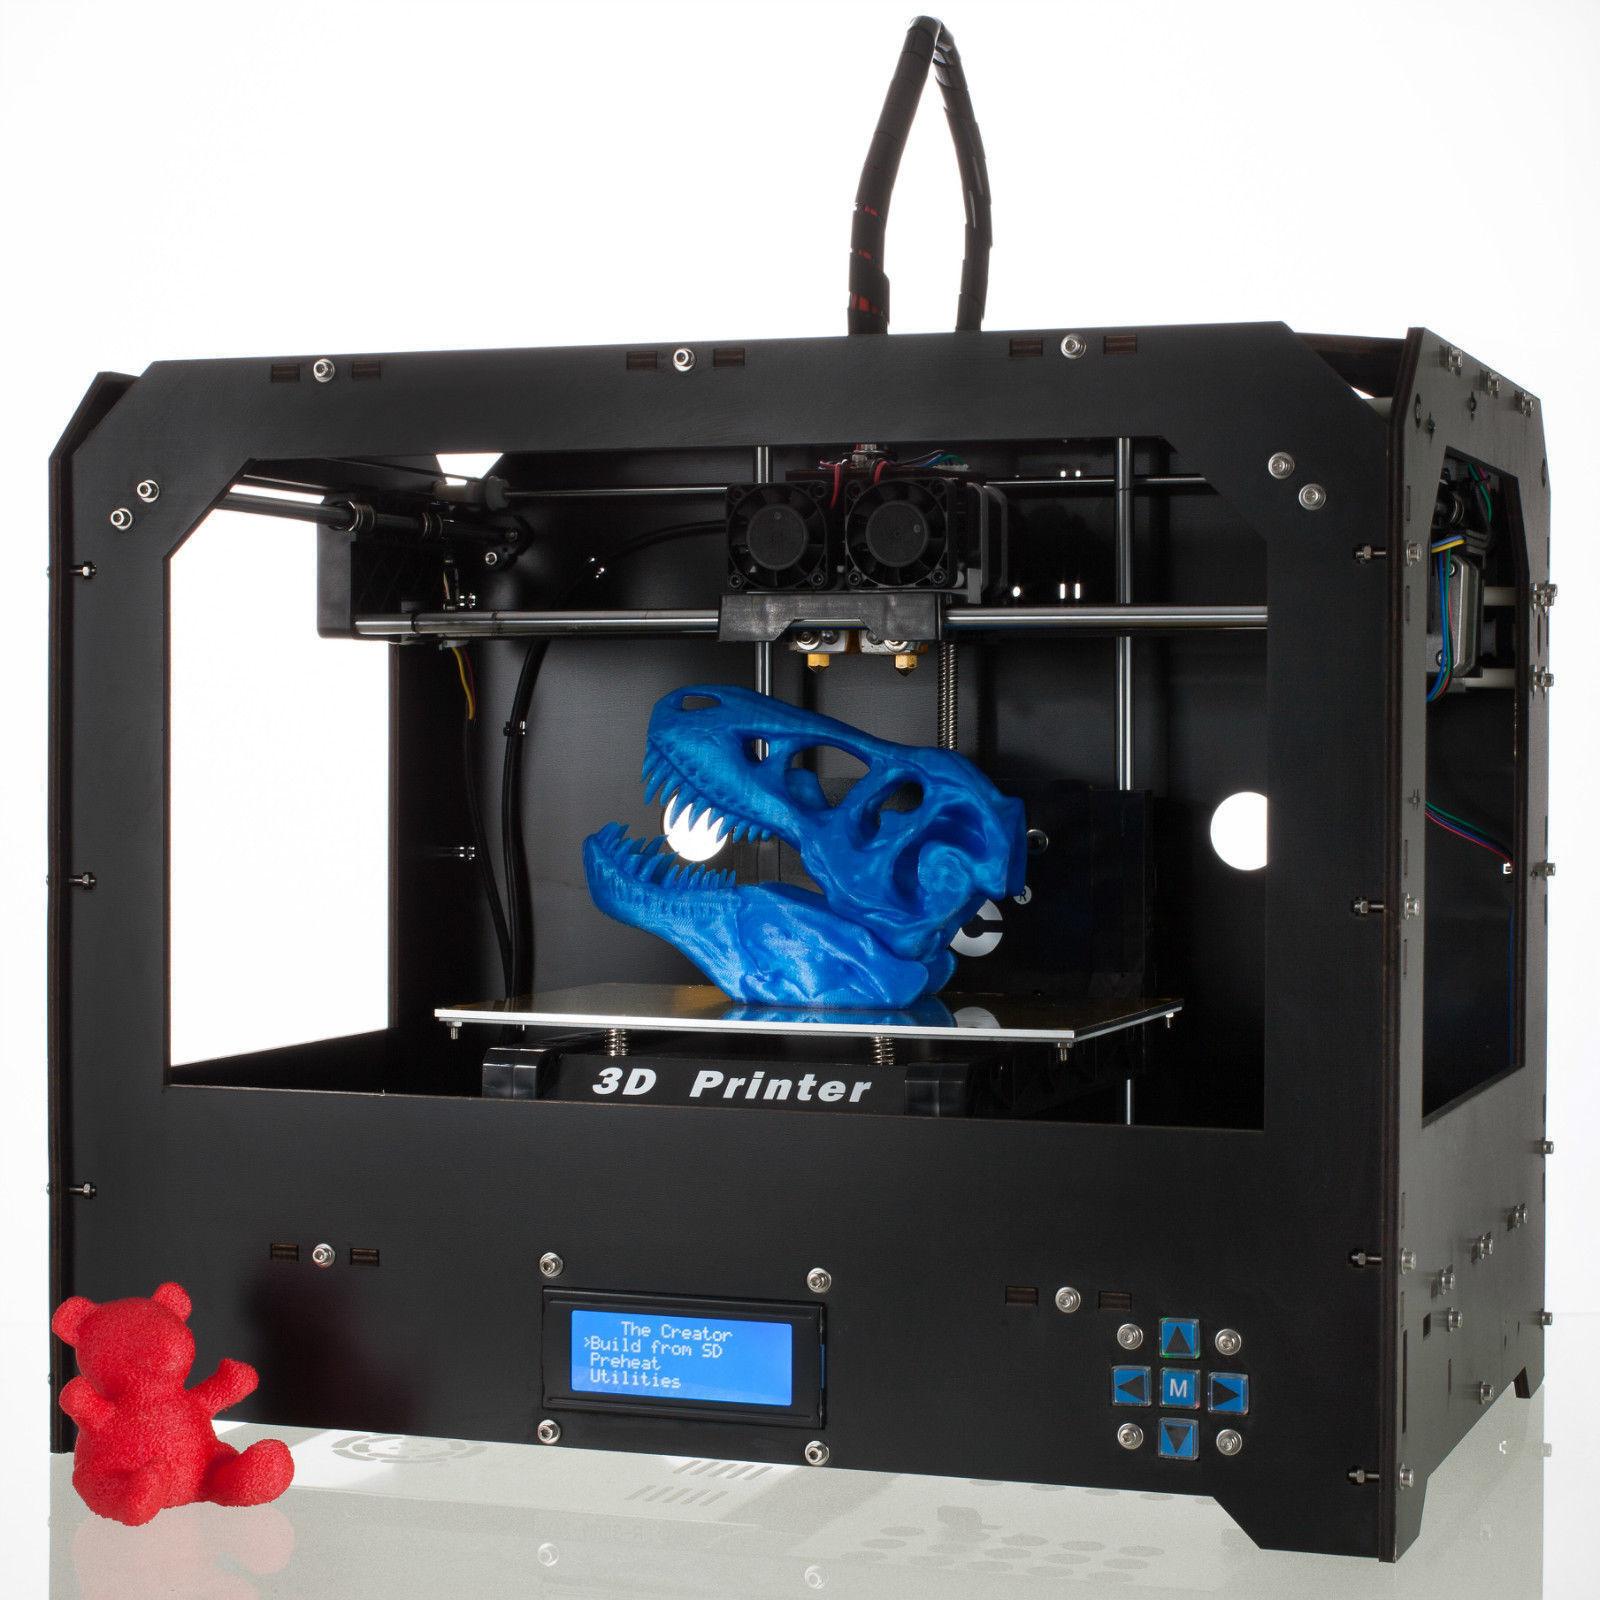 Black 3d Printer for Makerbot Replicator 2 Dual Extruders 1 PLA Filament